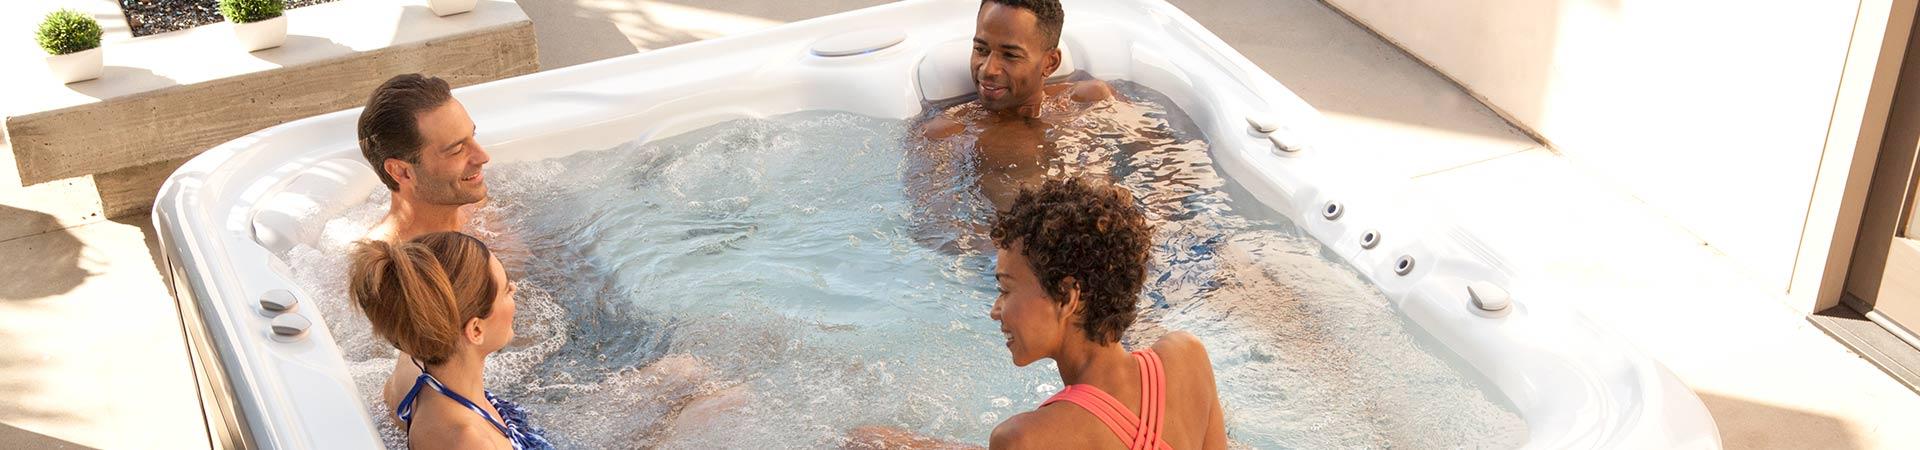 3 Ways to Improve Family Health, Hot Tubs Dealer Creve Coer, St. Charles, Wentzville